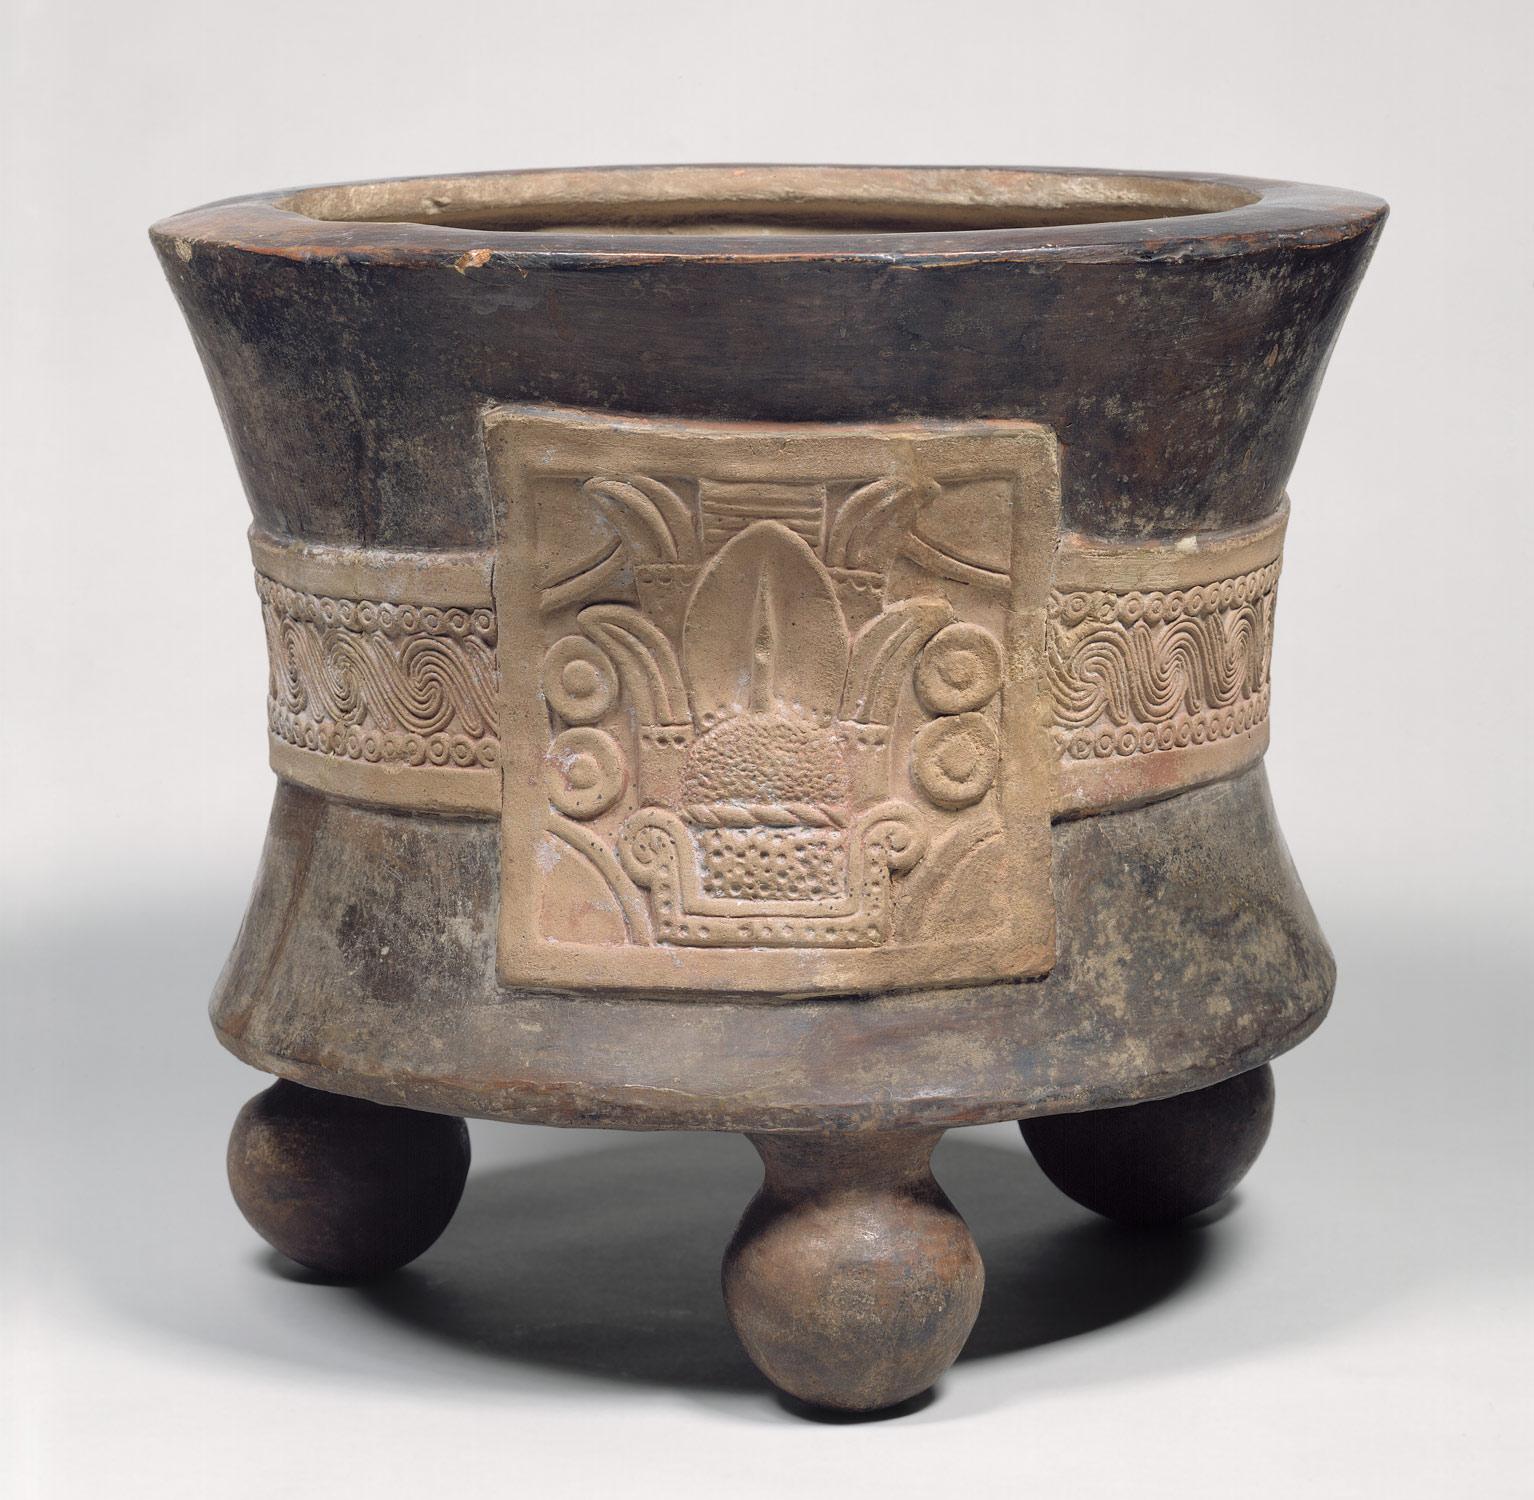 Tripod Vessel with Date Glyph